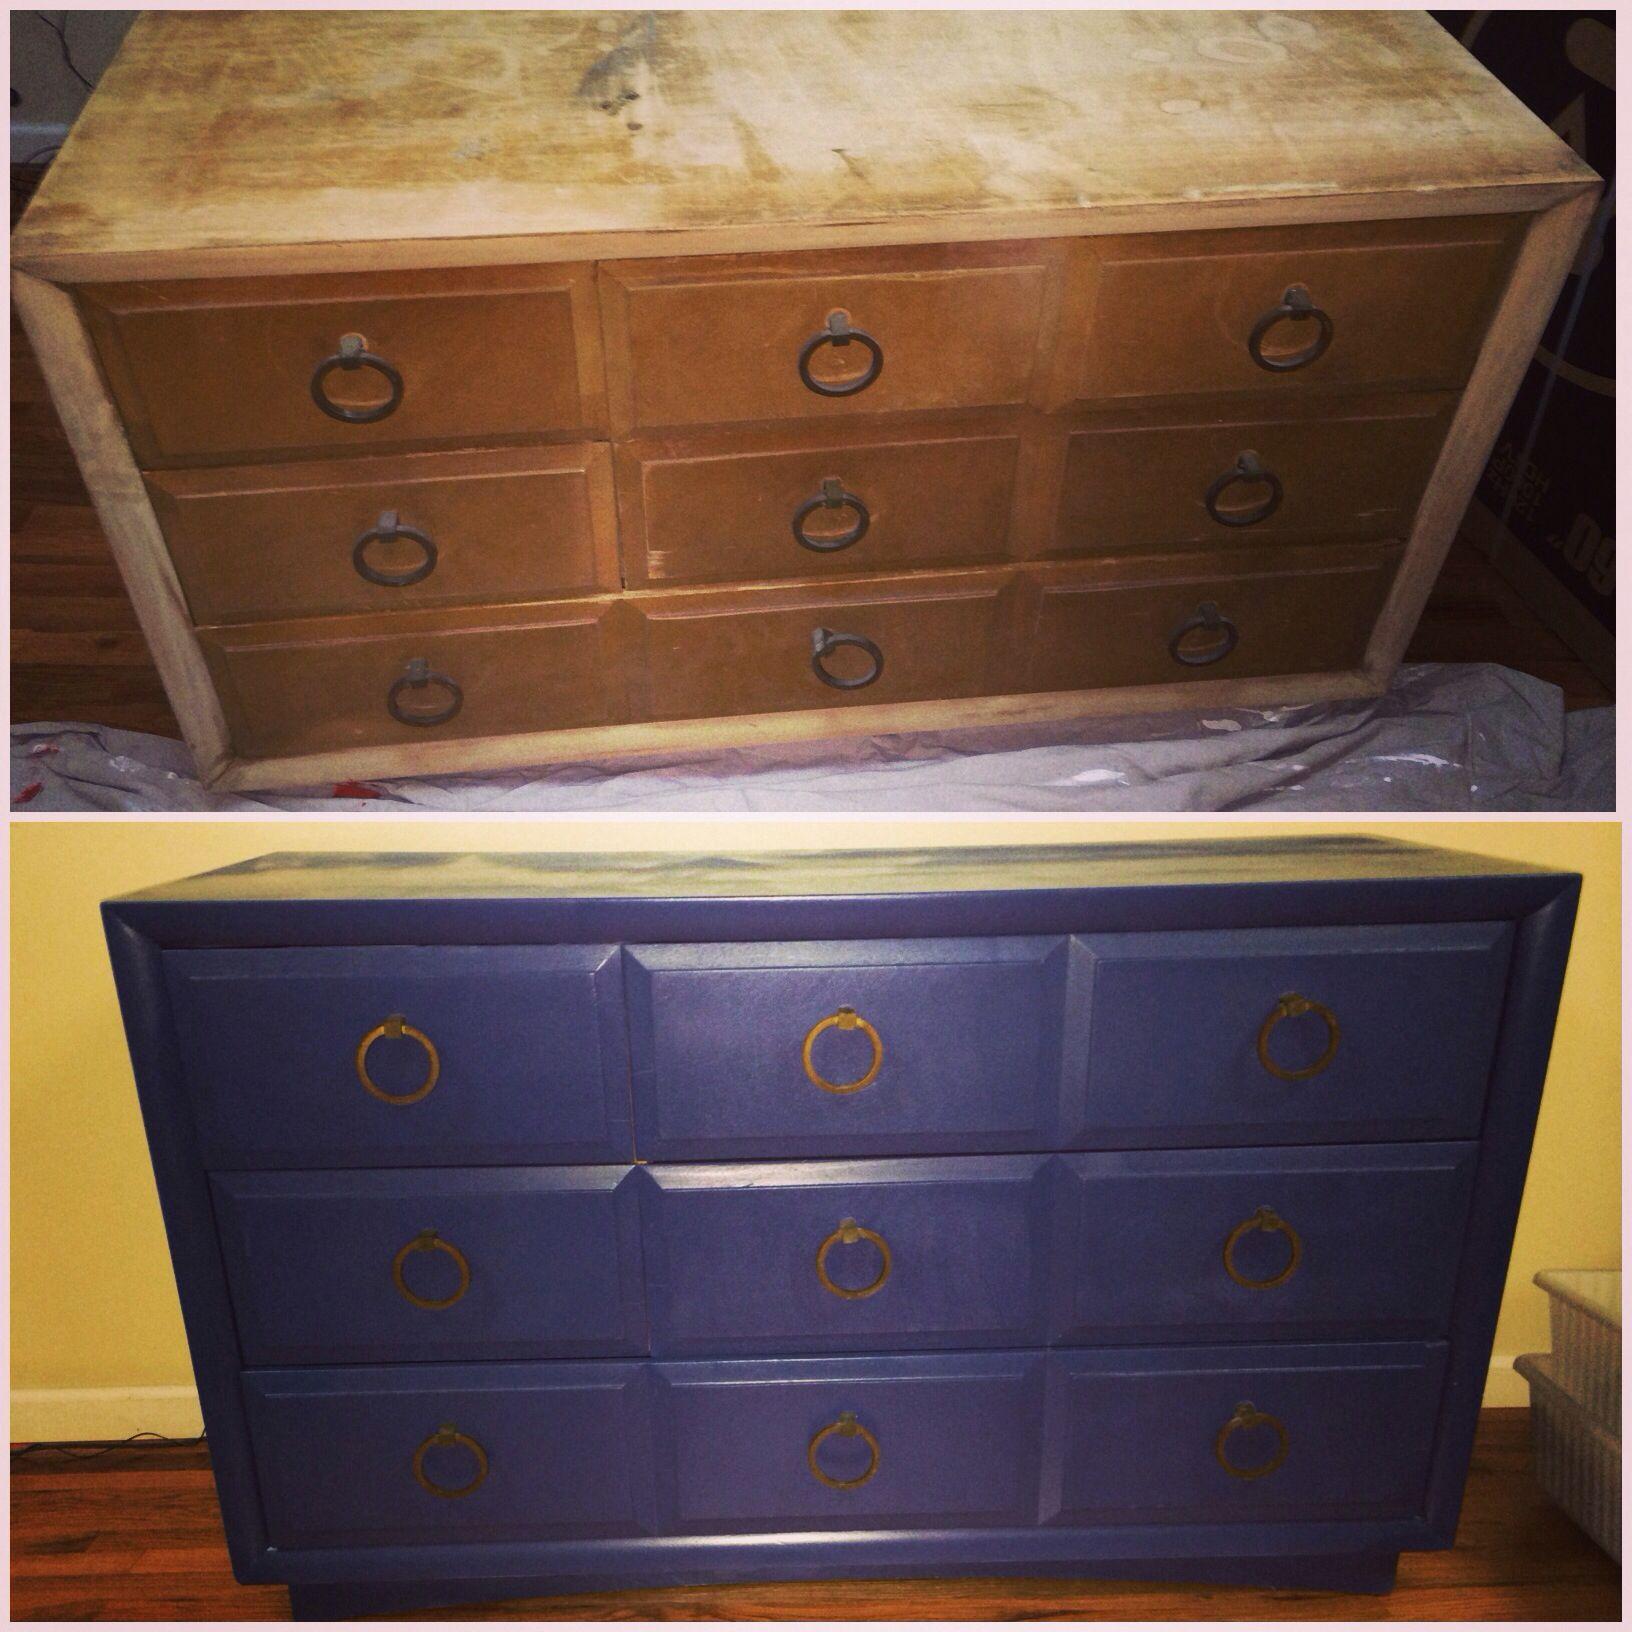 Old Dresser Made New Used a Coarse Sanding Sponge Rustoleum 2x